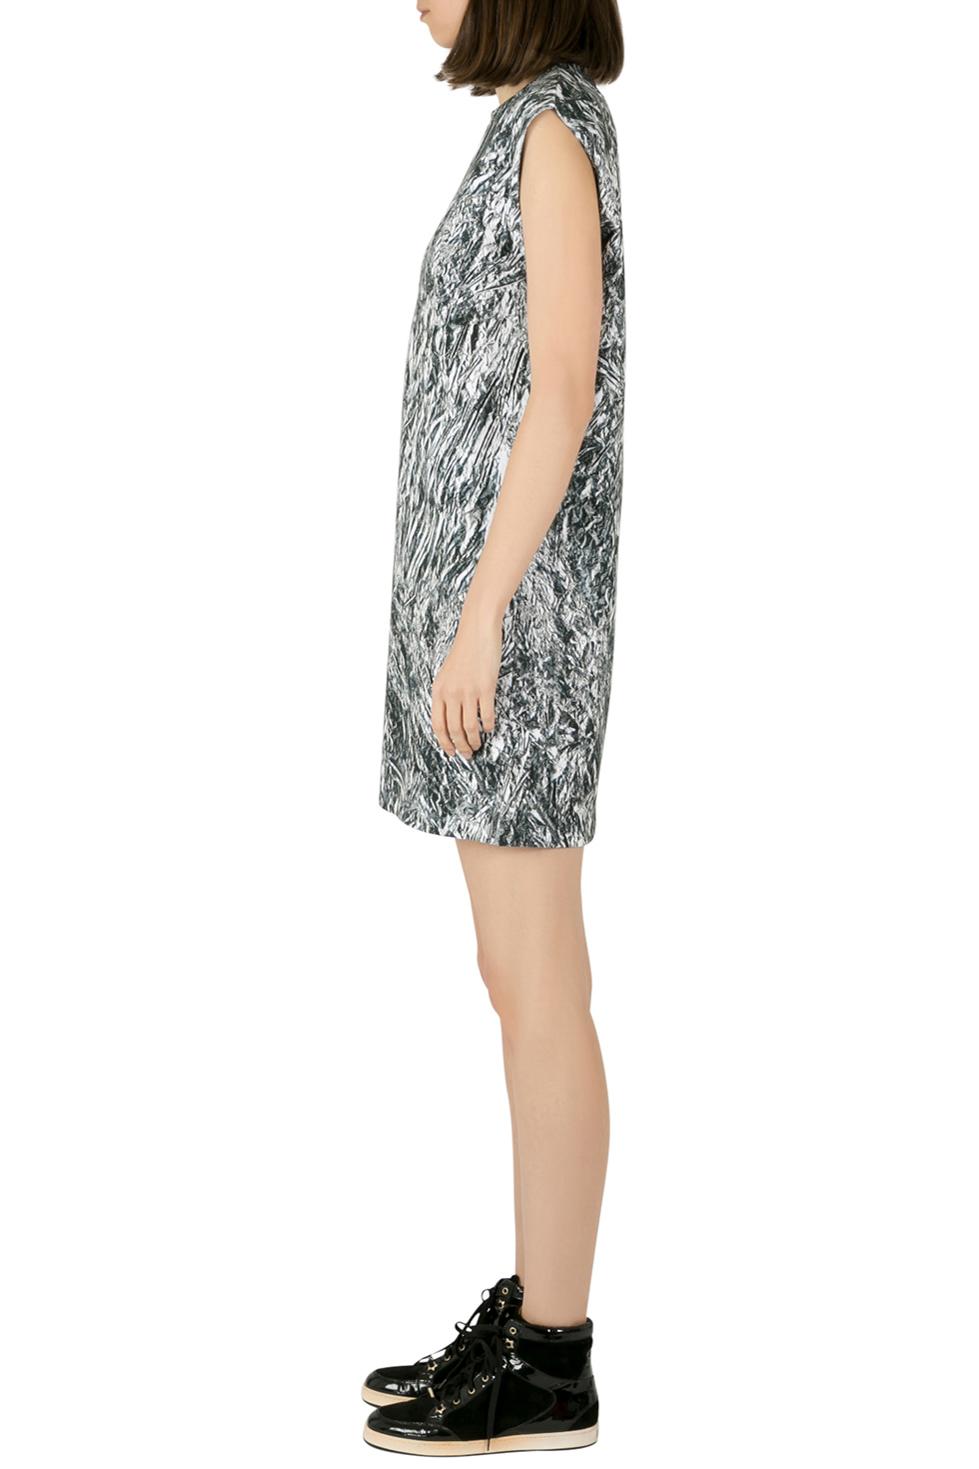 McQ by Alexander McQueen Silver Foil Printed Cotton Stretch Sleeveless Shift Dress, Black